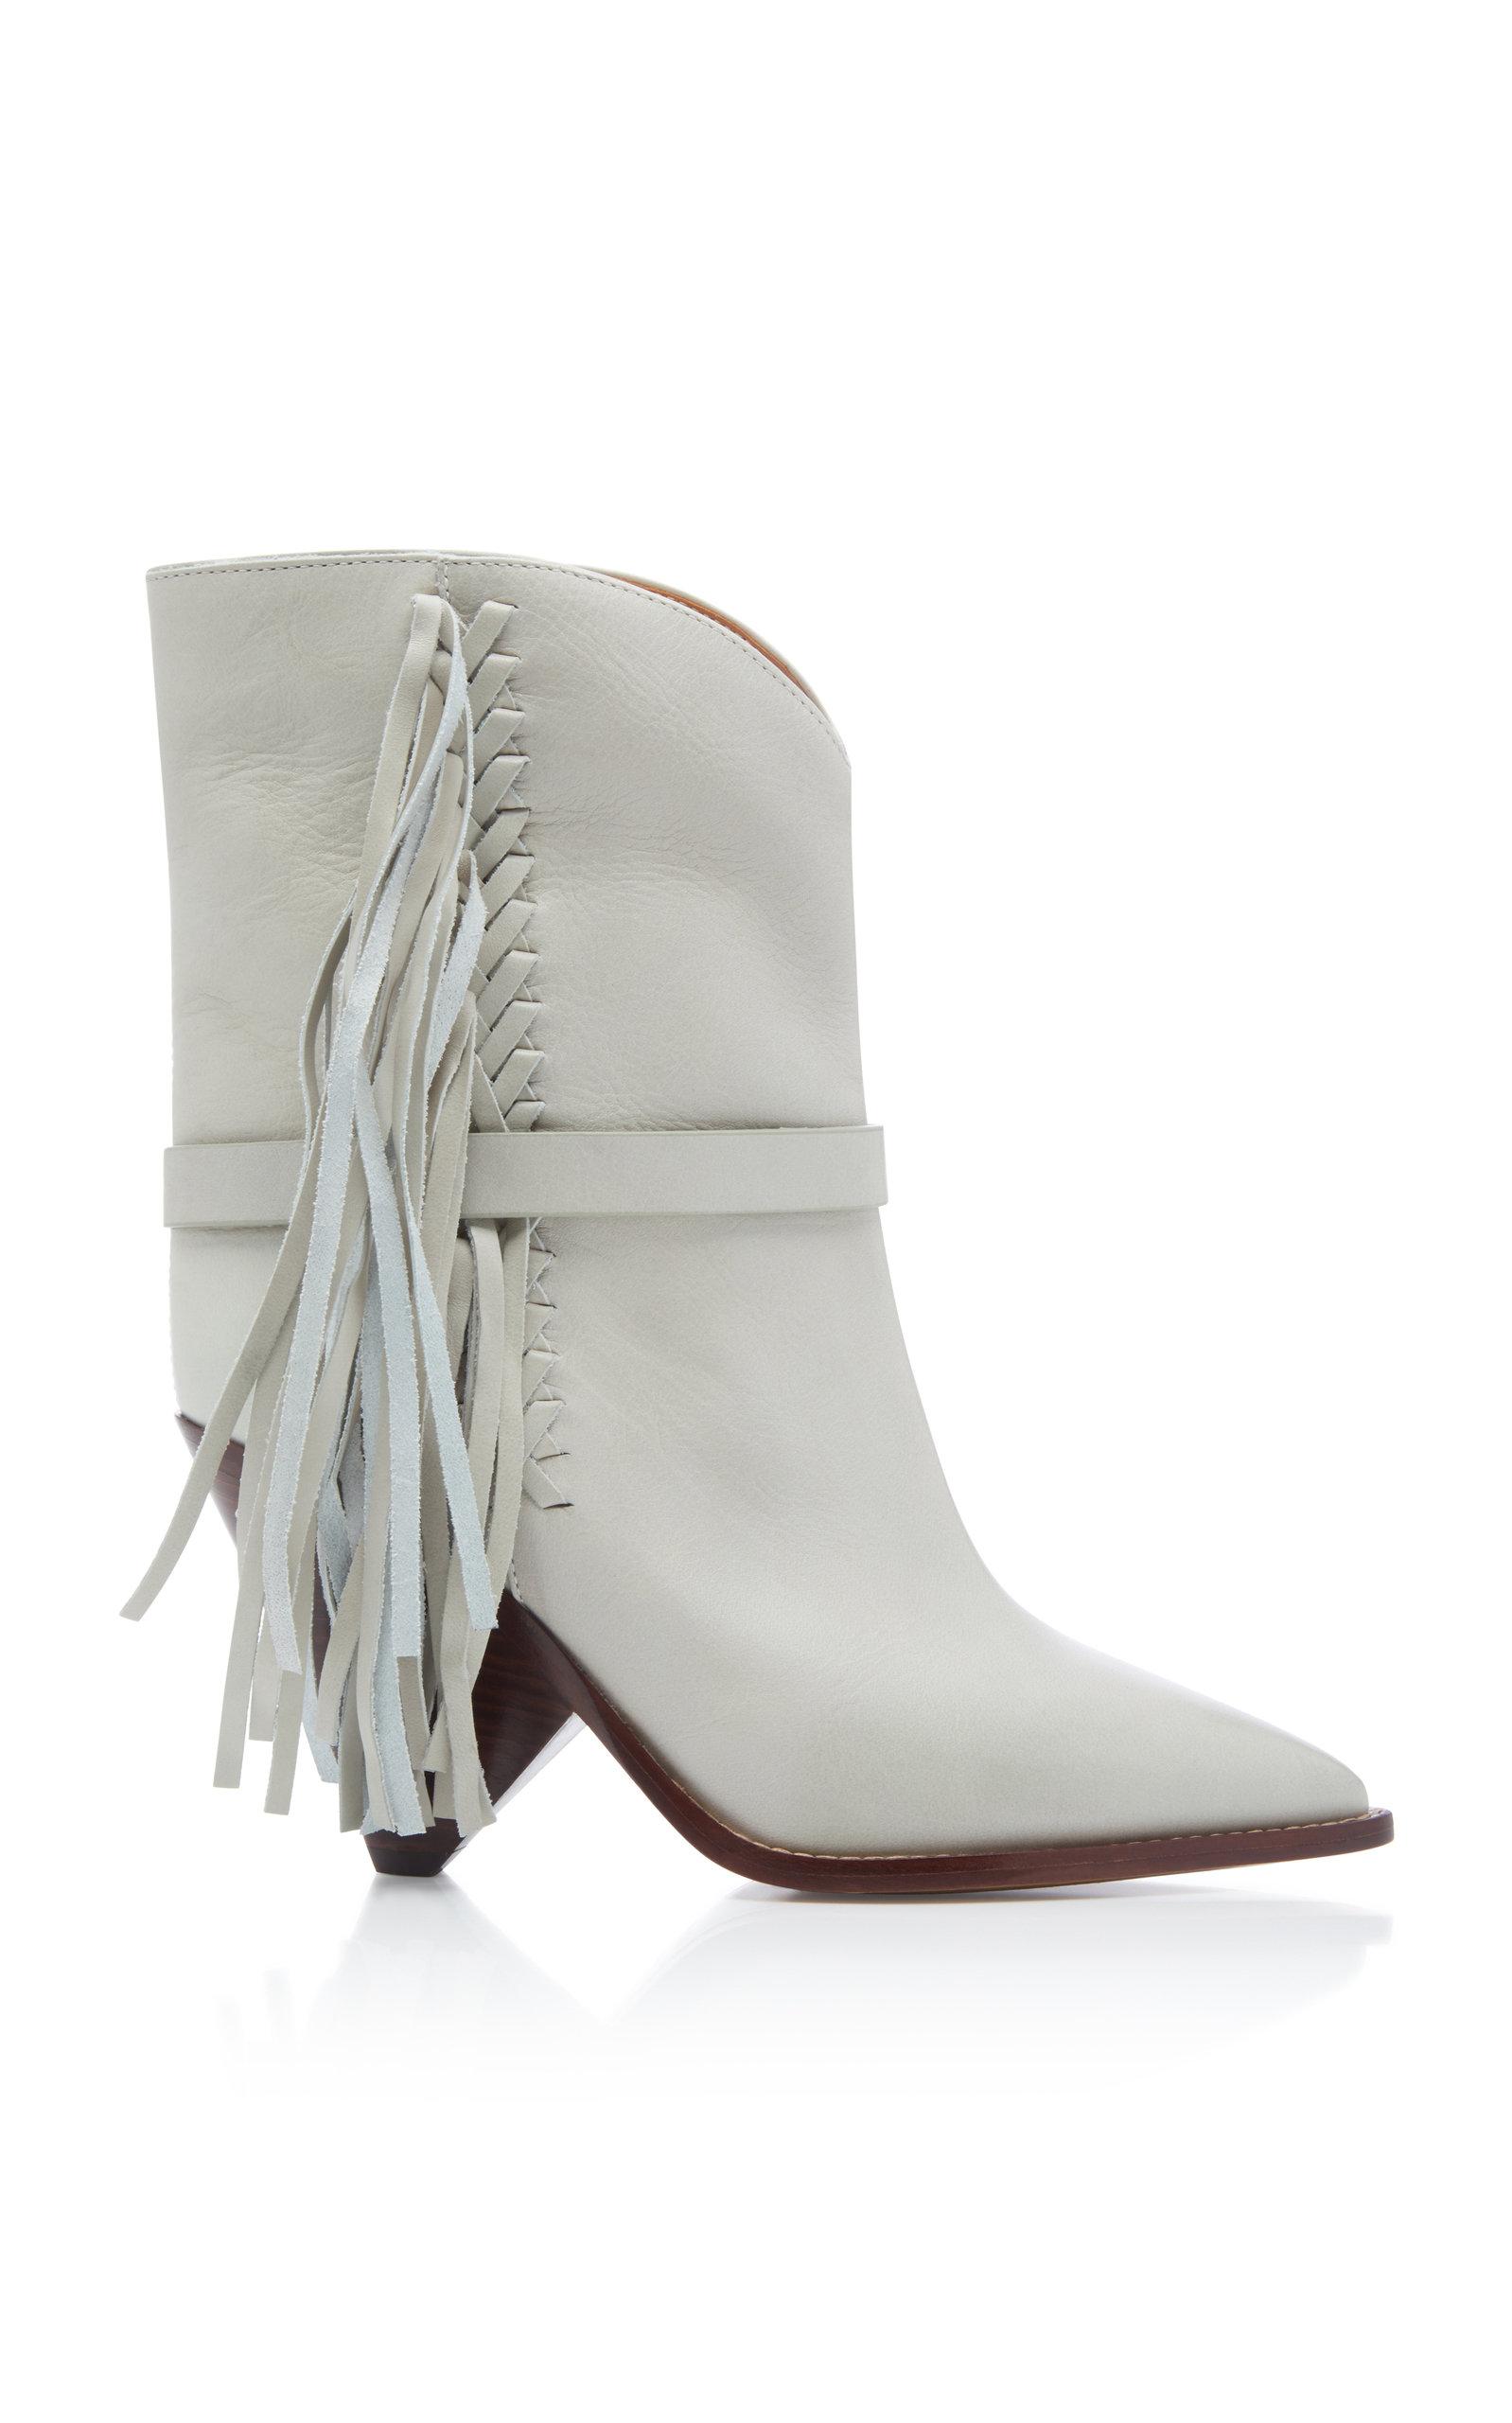 cab25184833 Loffen Tasseled Leather Ankle Boots by Isabel Marant | Moda Operandi